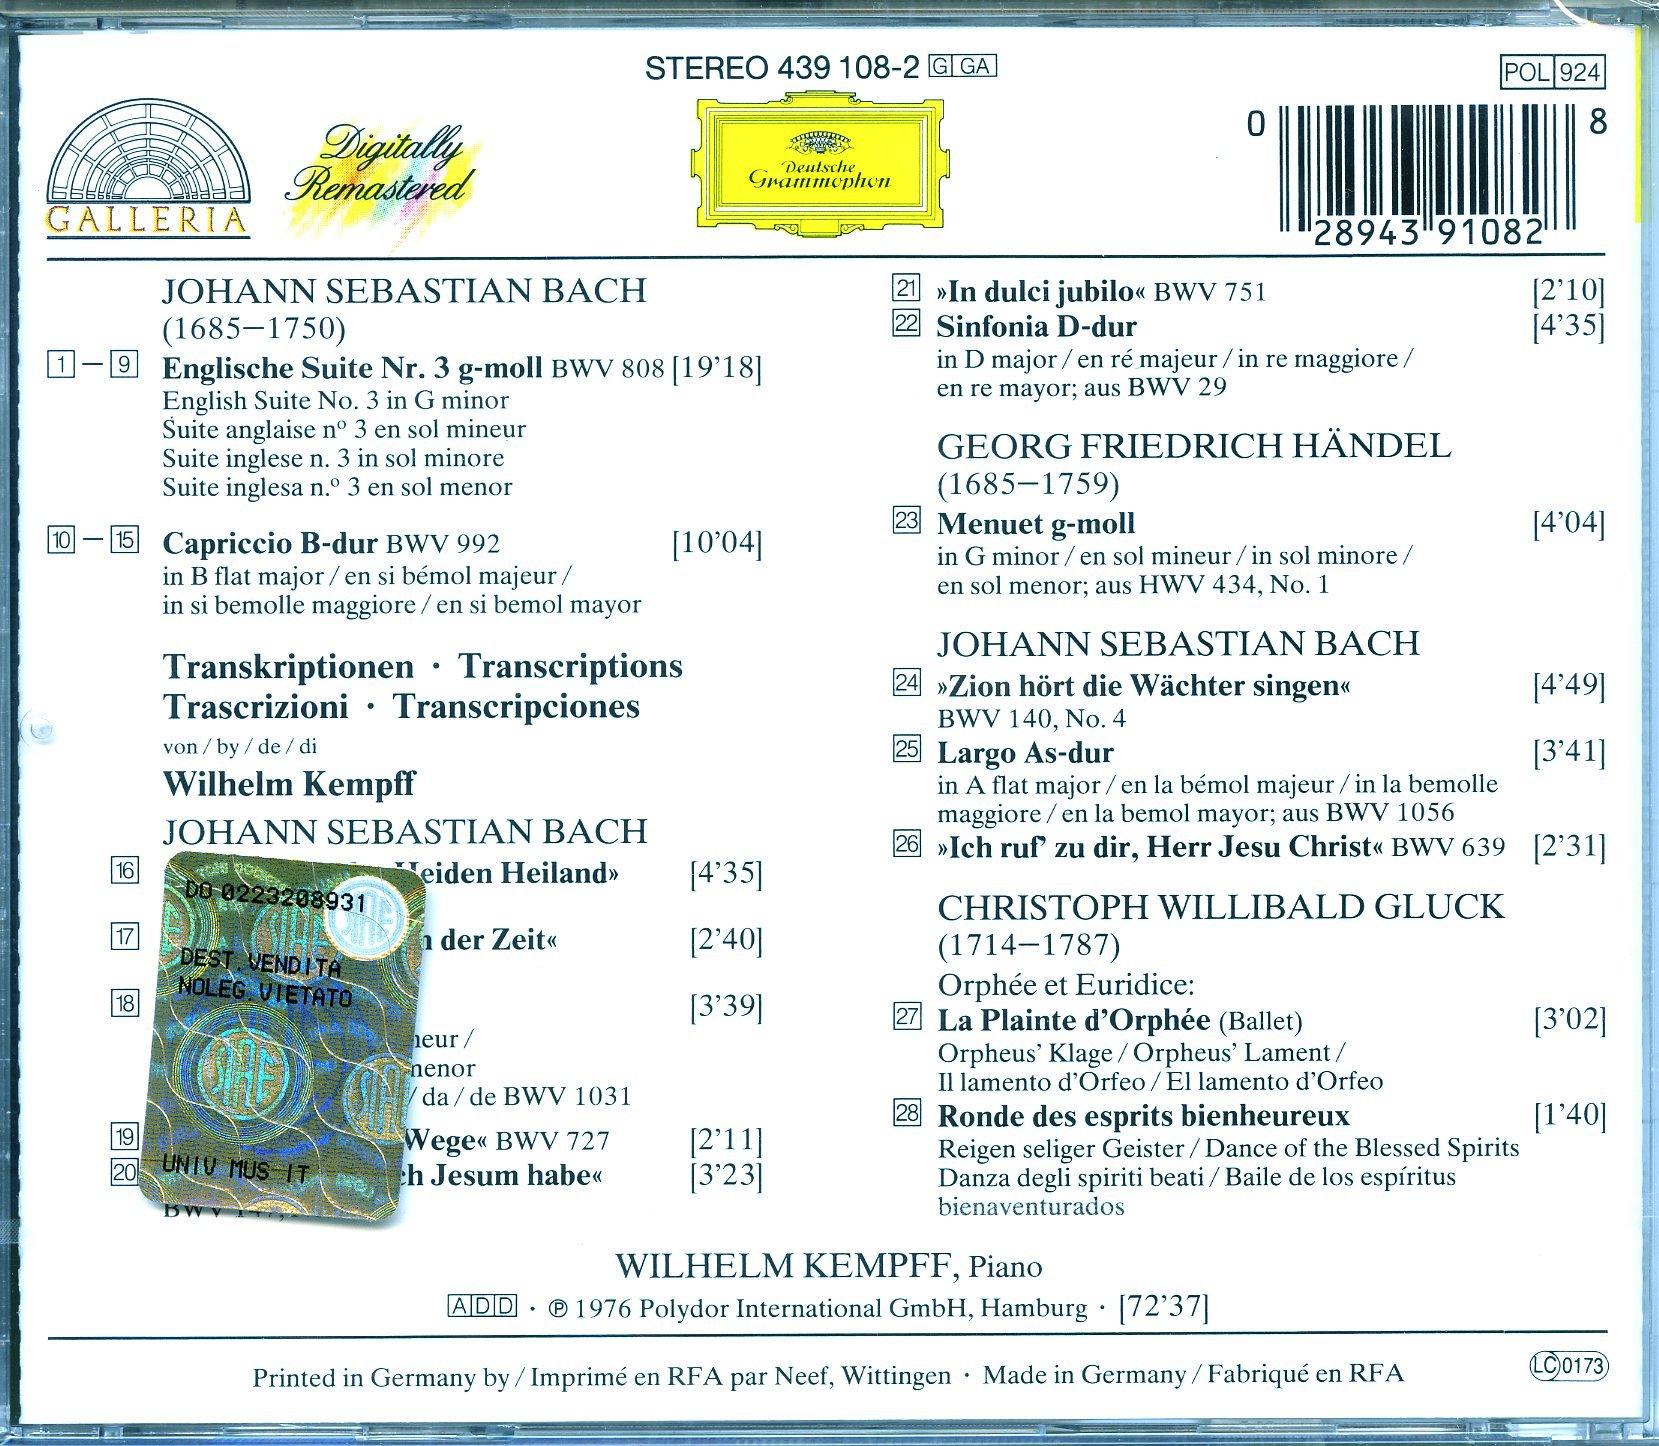 Kempff Plays Bach: English Suite No. 3; Capriccio in B flat; Transcriptions of J.S. Bach, Handel, & Gluck by Deutsche Grammophon